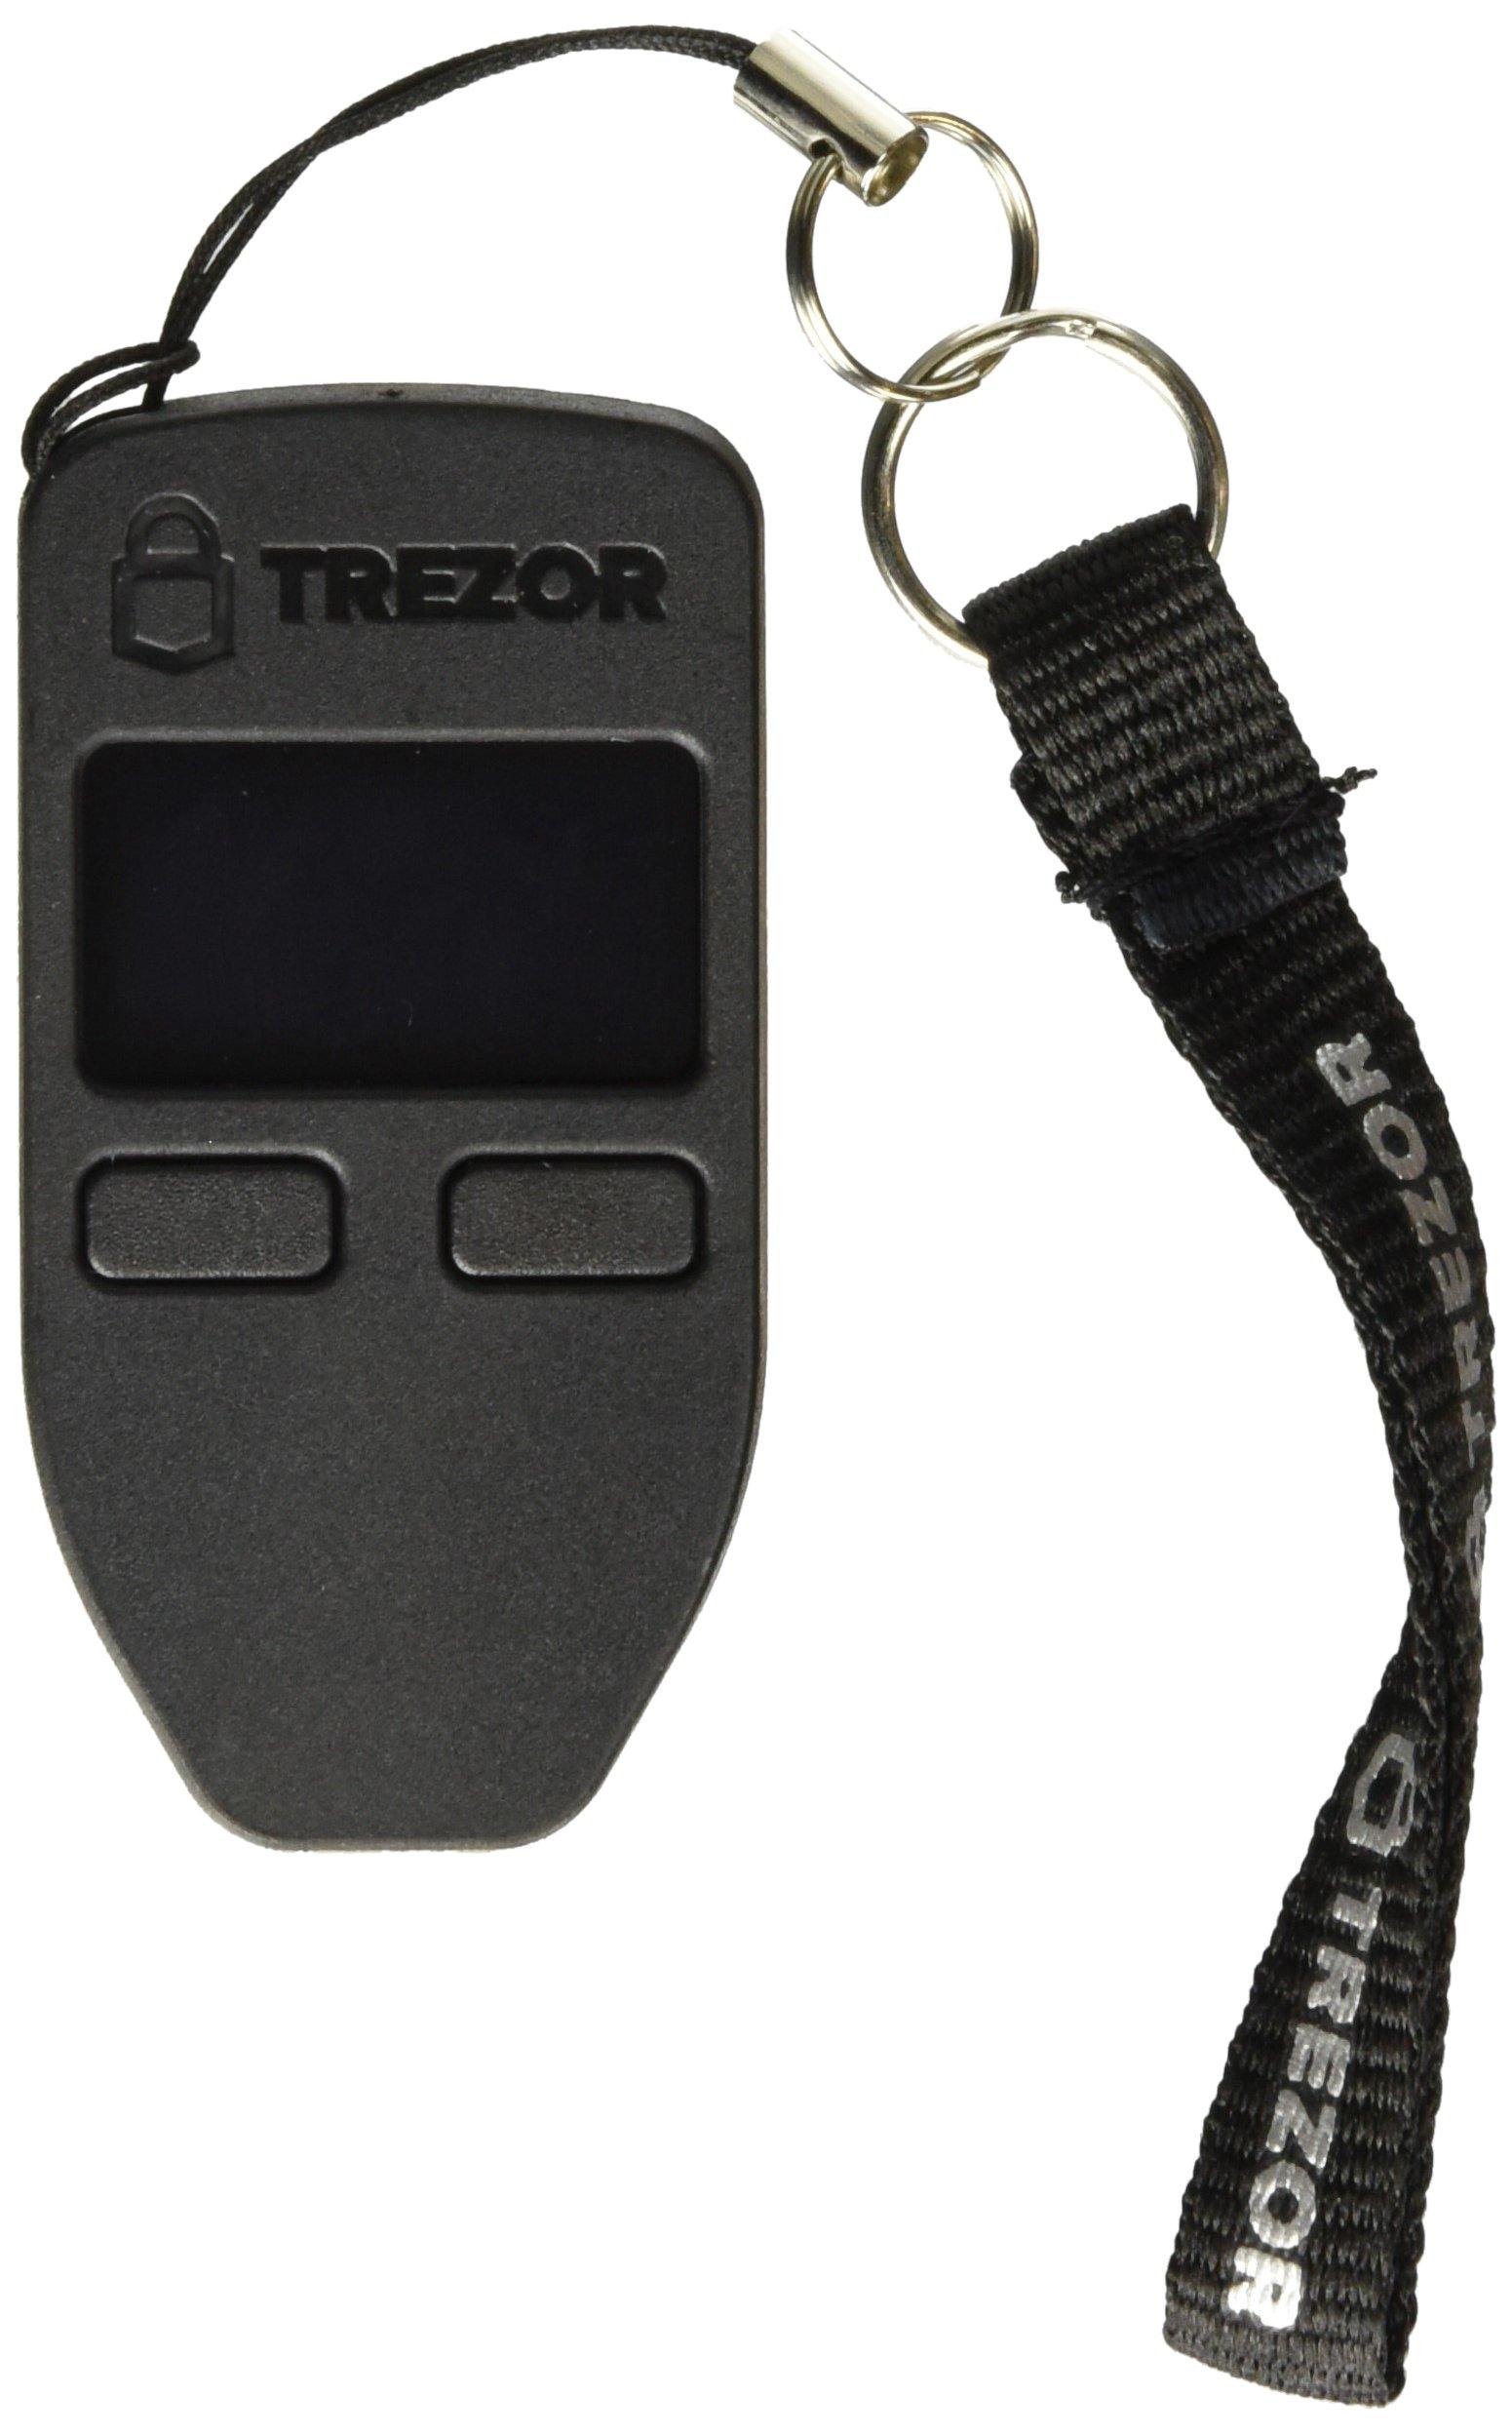 Trezor bitcoin wallet, Black by Trezor (Image #2)